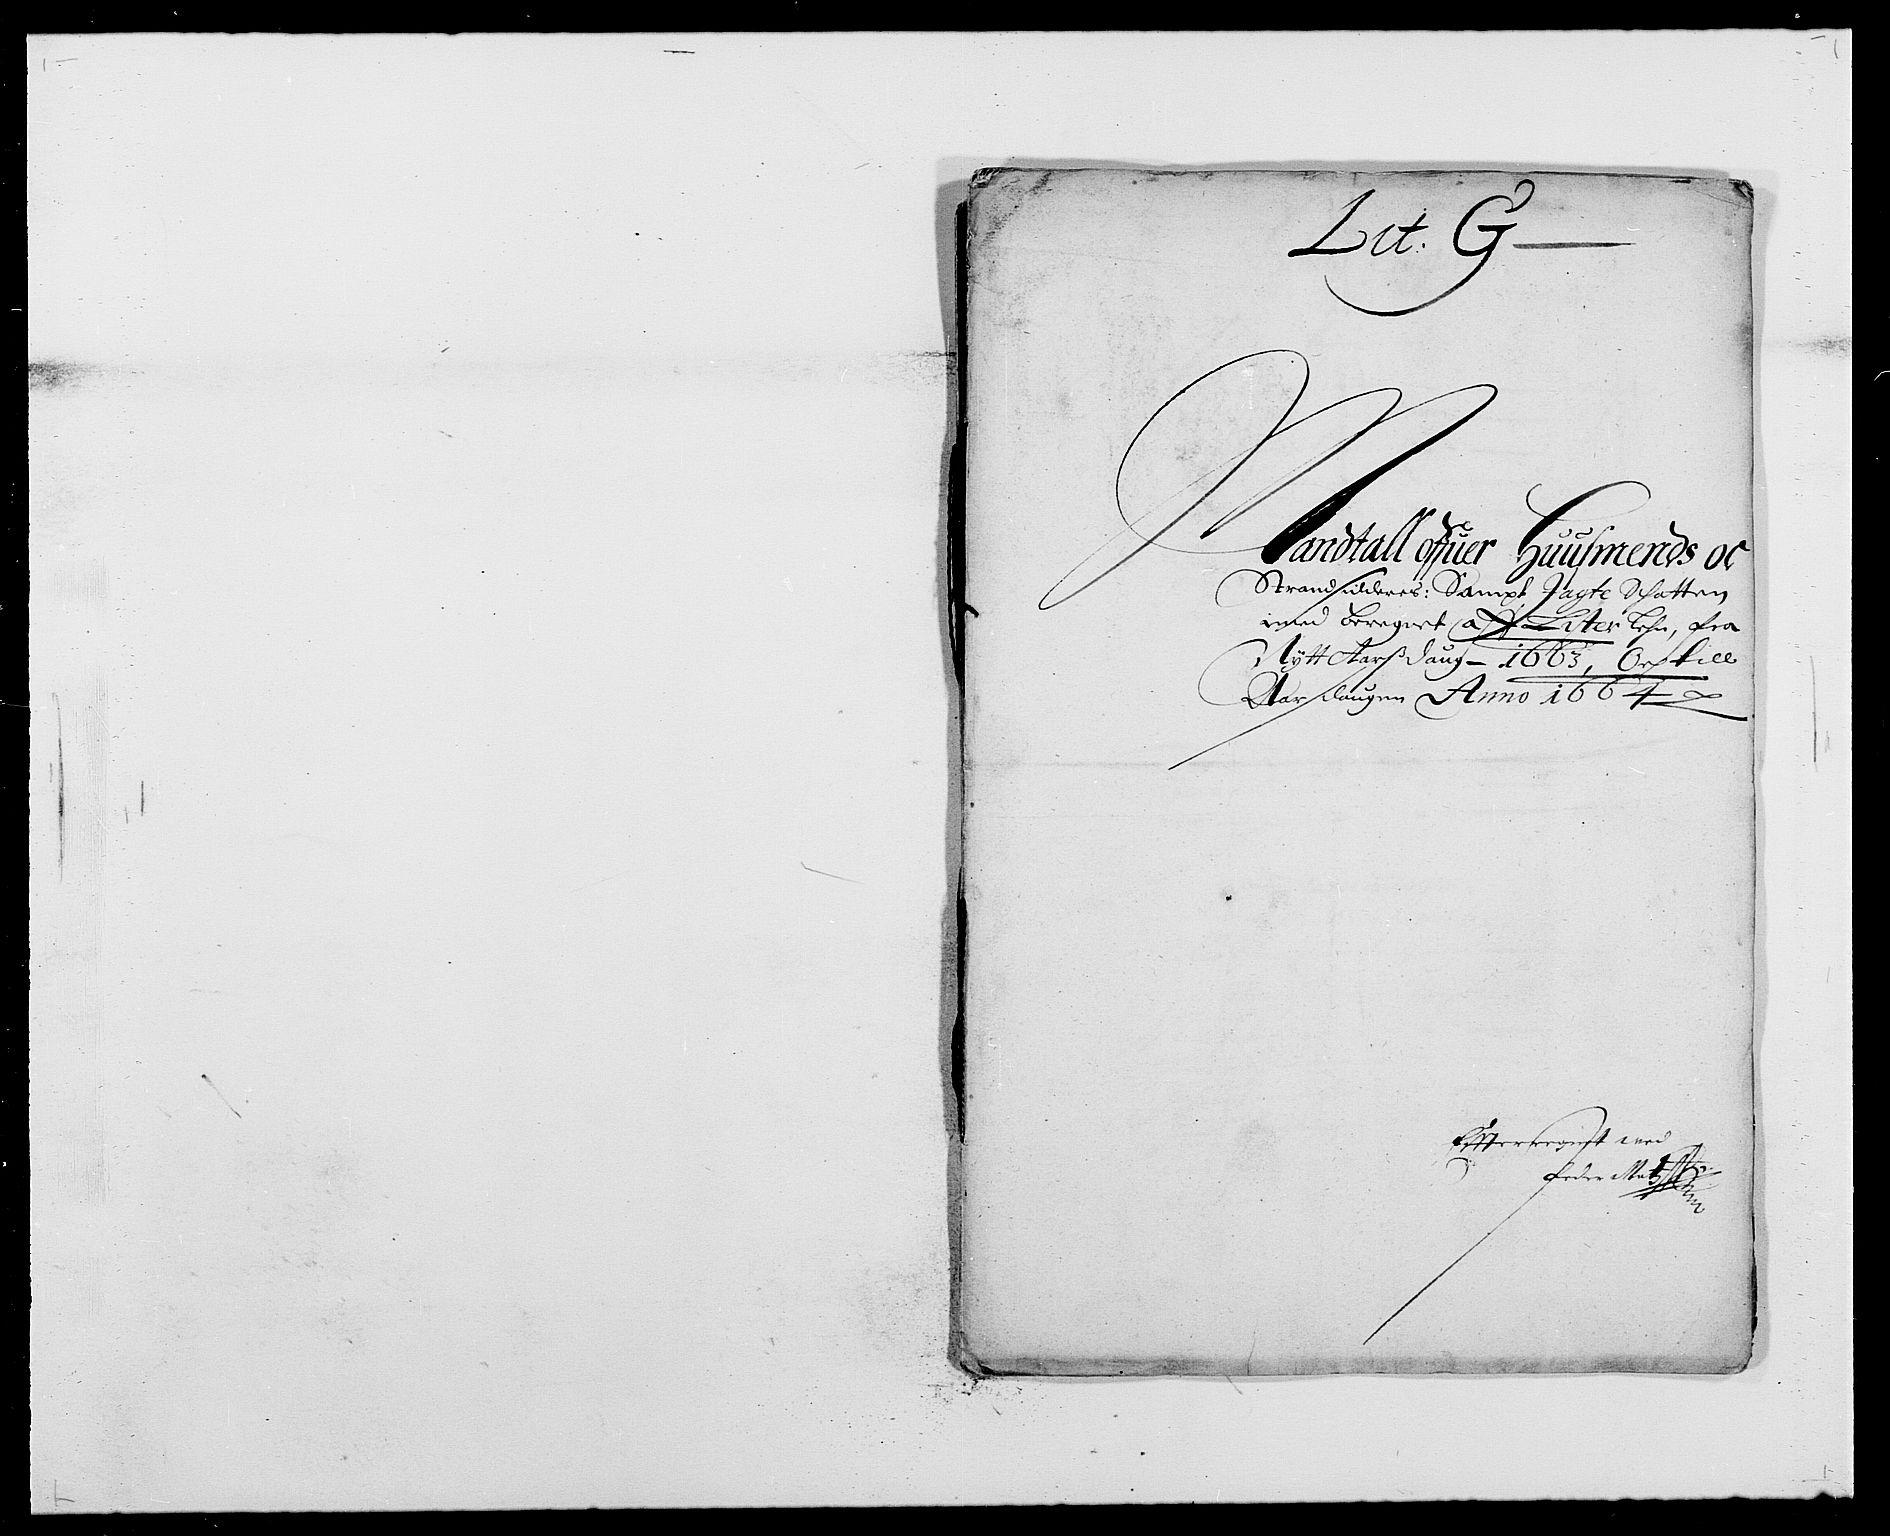 RA, Rentekammeret inntil 1814, Reviderte regnskaper, Fogderegnskap, R41/L2523: Fogderegnskap Lista, 1663-1664, s. 147